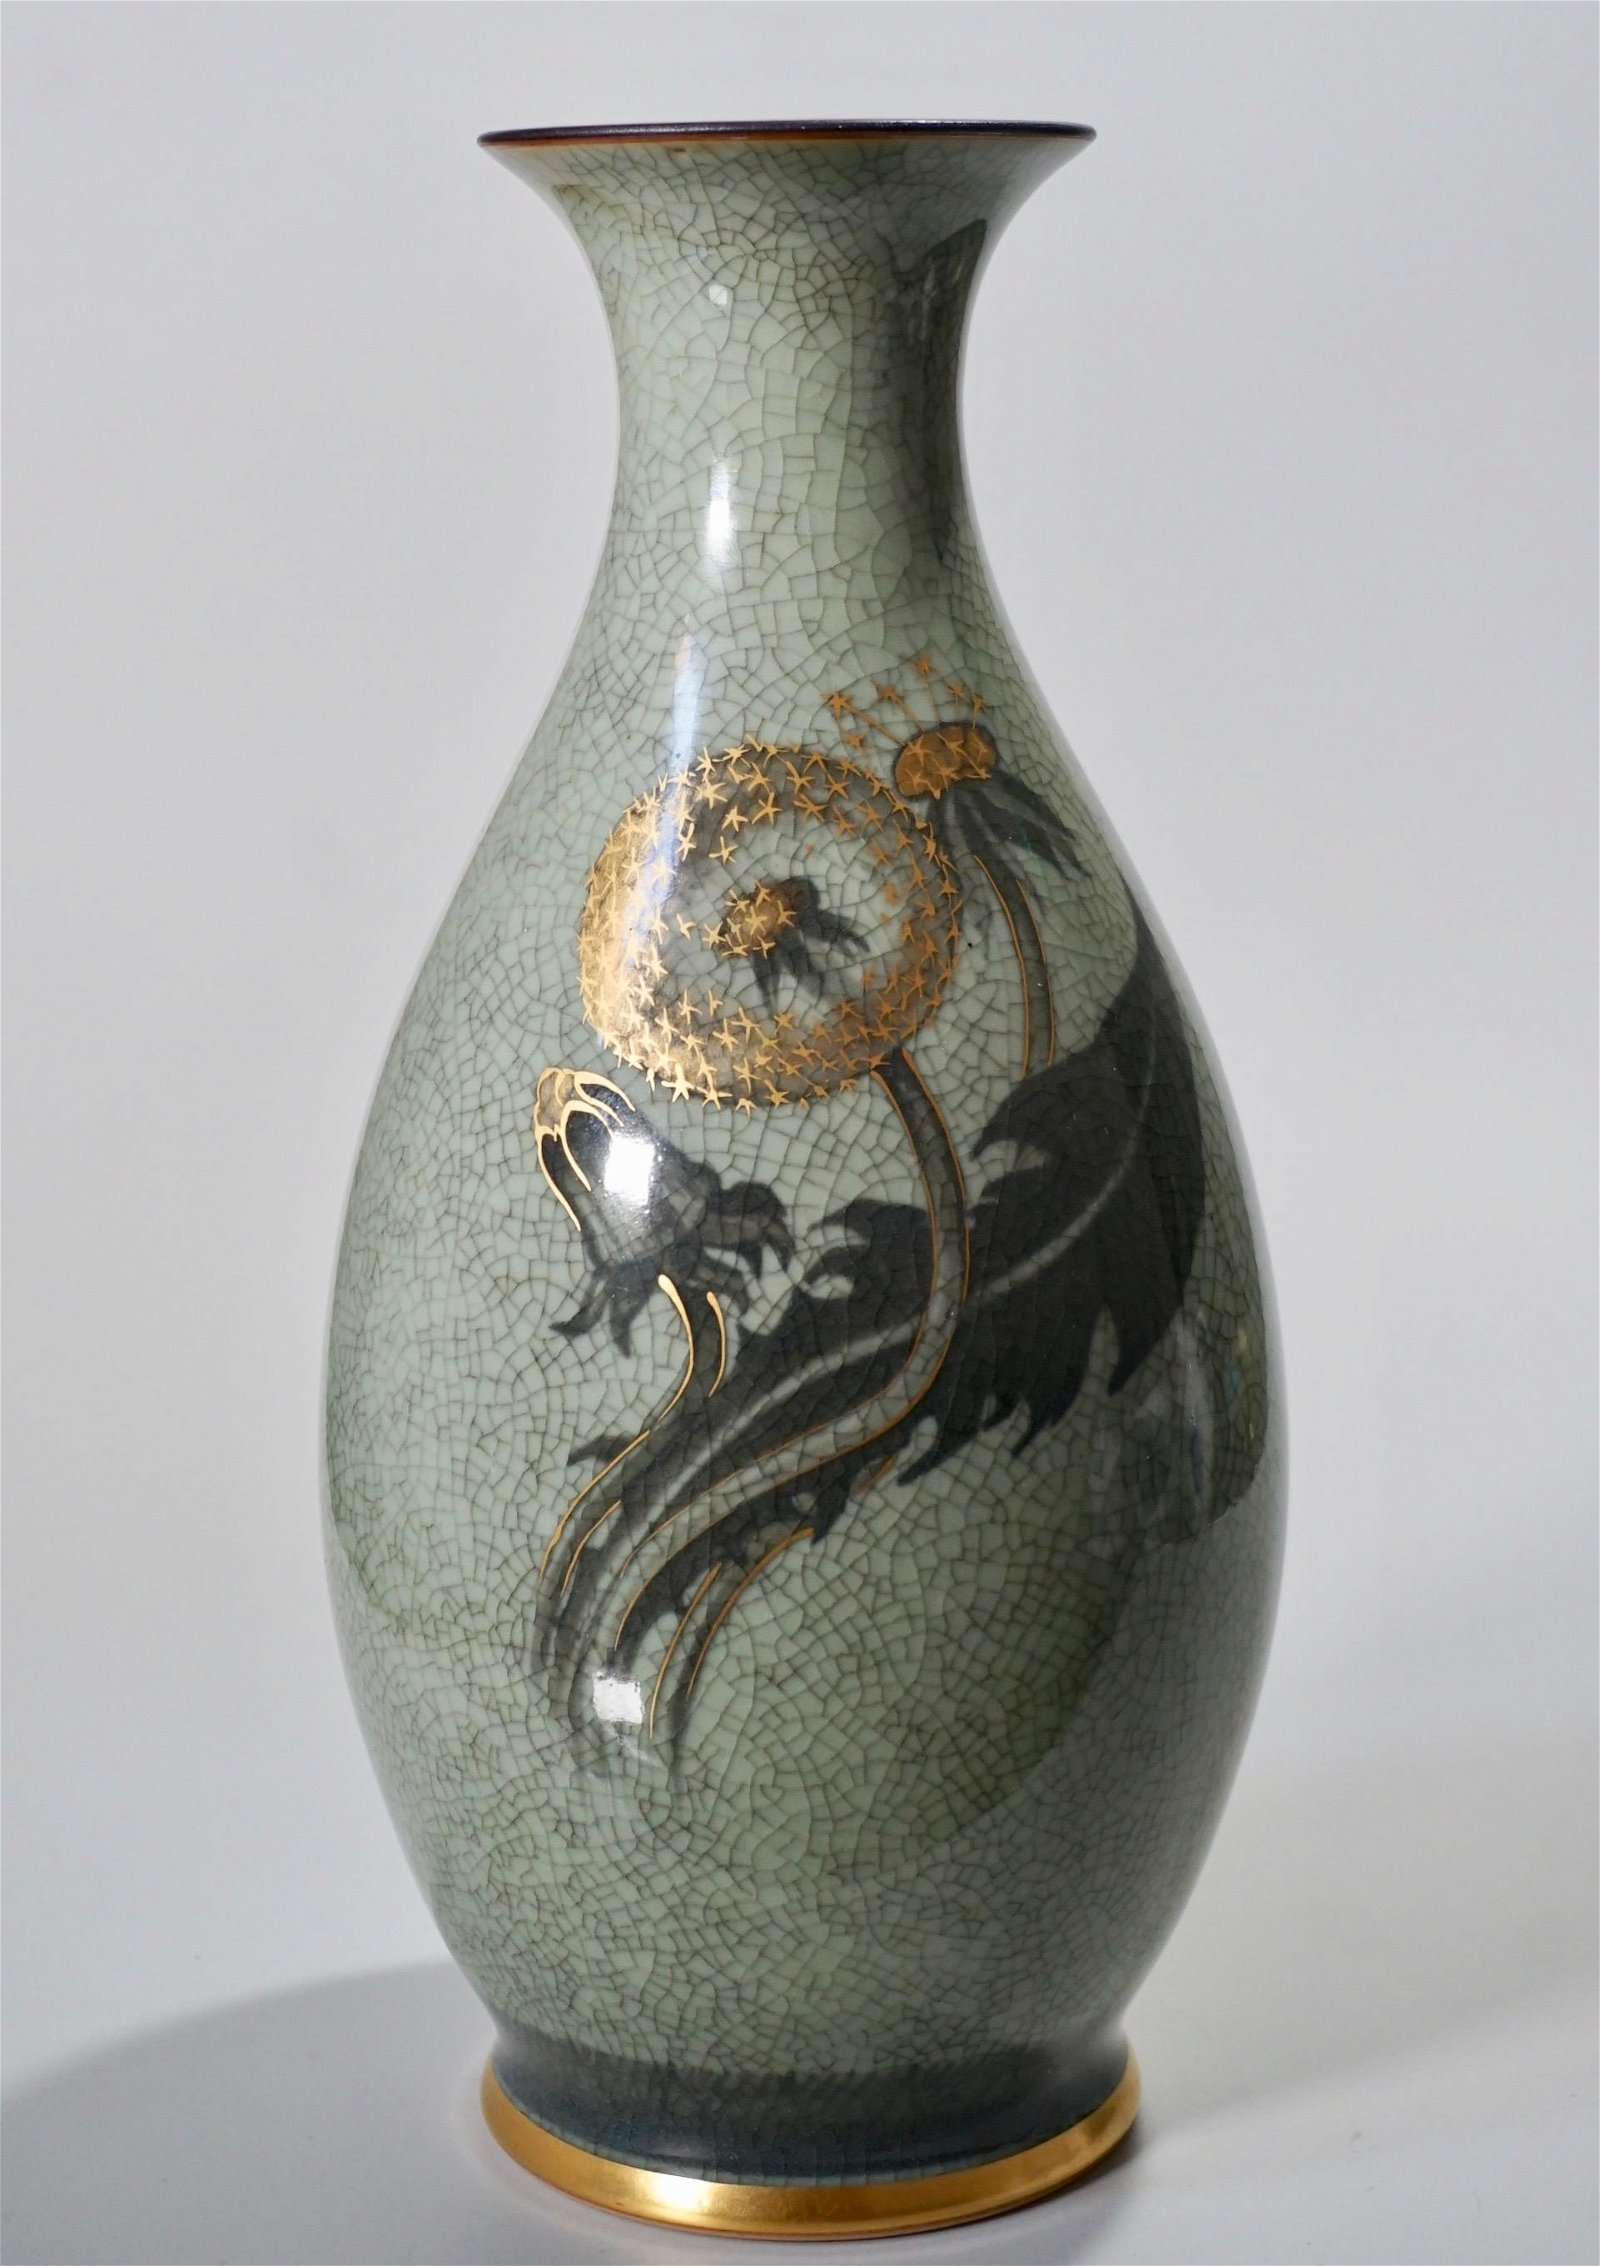 Knud Andersen Royal Copenhagen Celadon Dandelion Vase